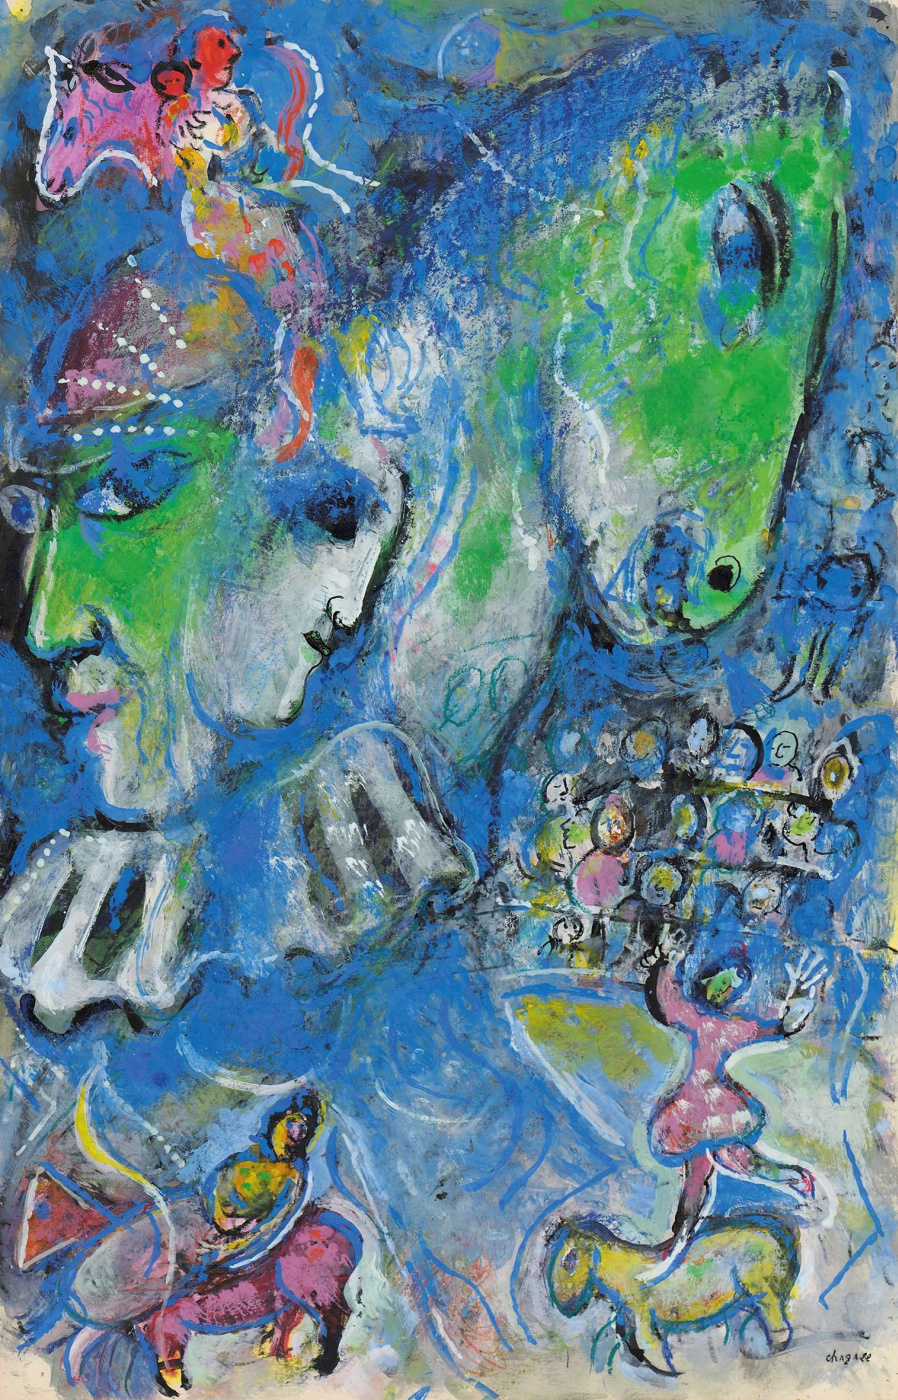 Марк Захарович Шагал. Два зеленых профиля в цирке